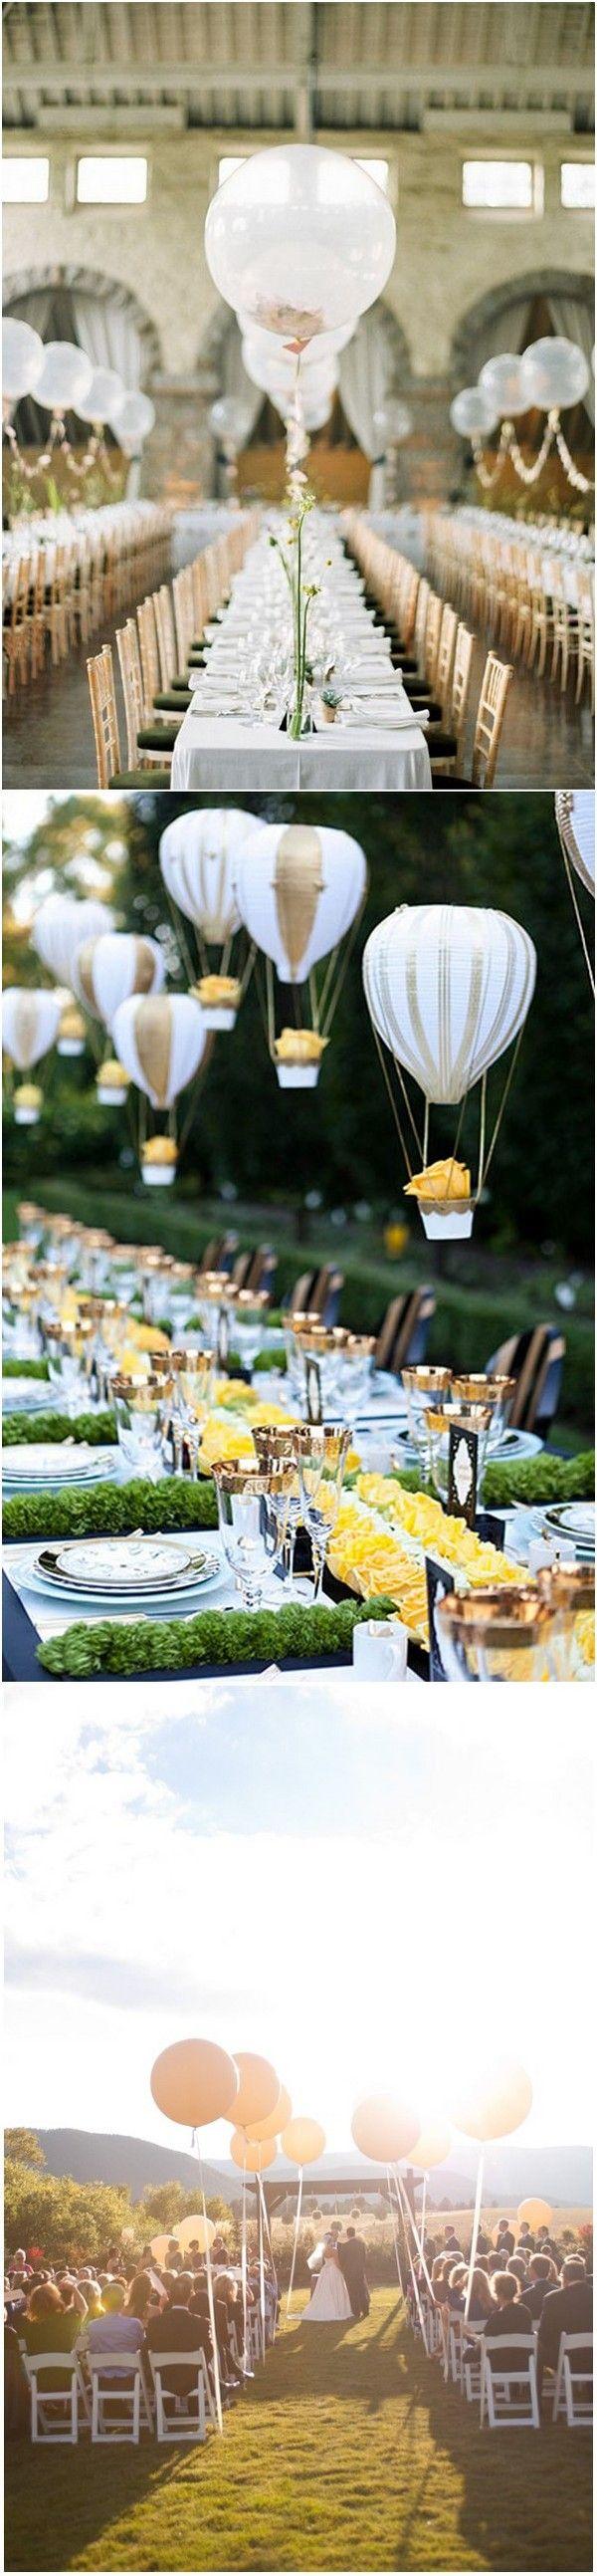 Wedding decoration ideas balloons   Romantic Wedding Decoration Ideas with Balloons  Page  of